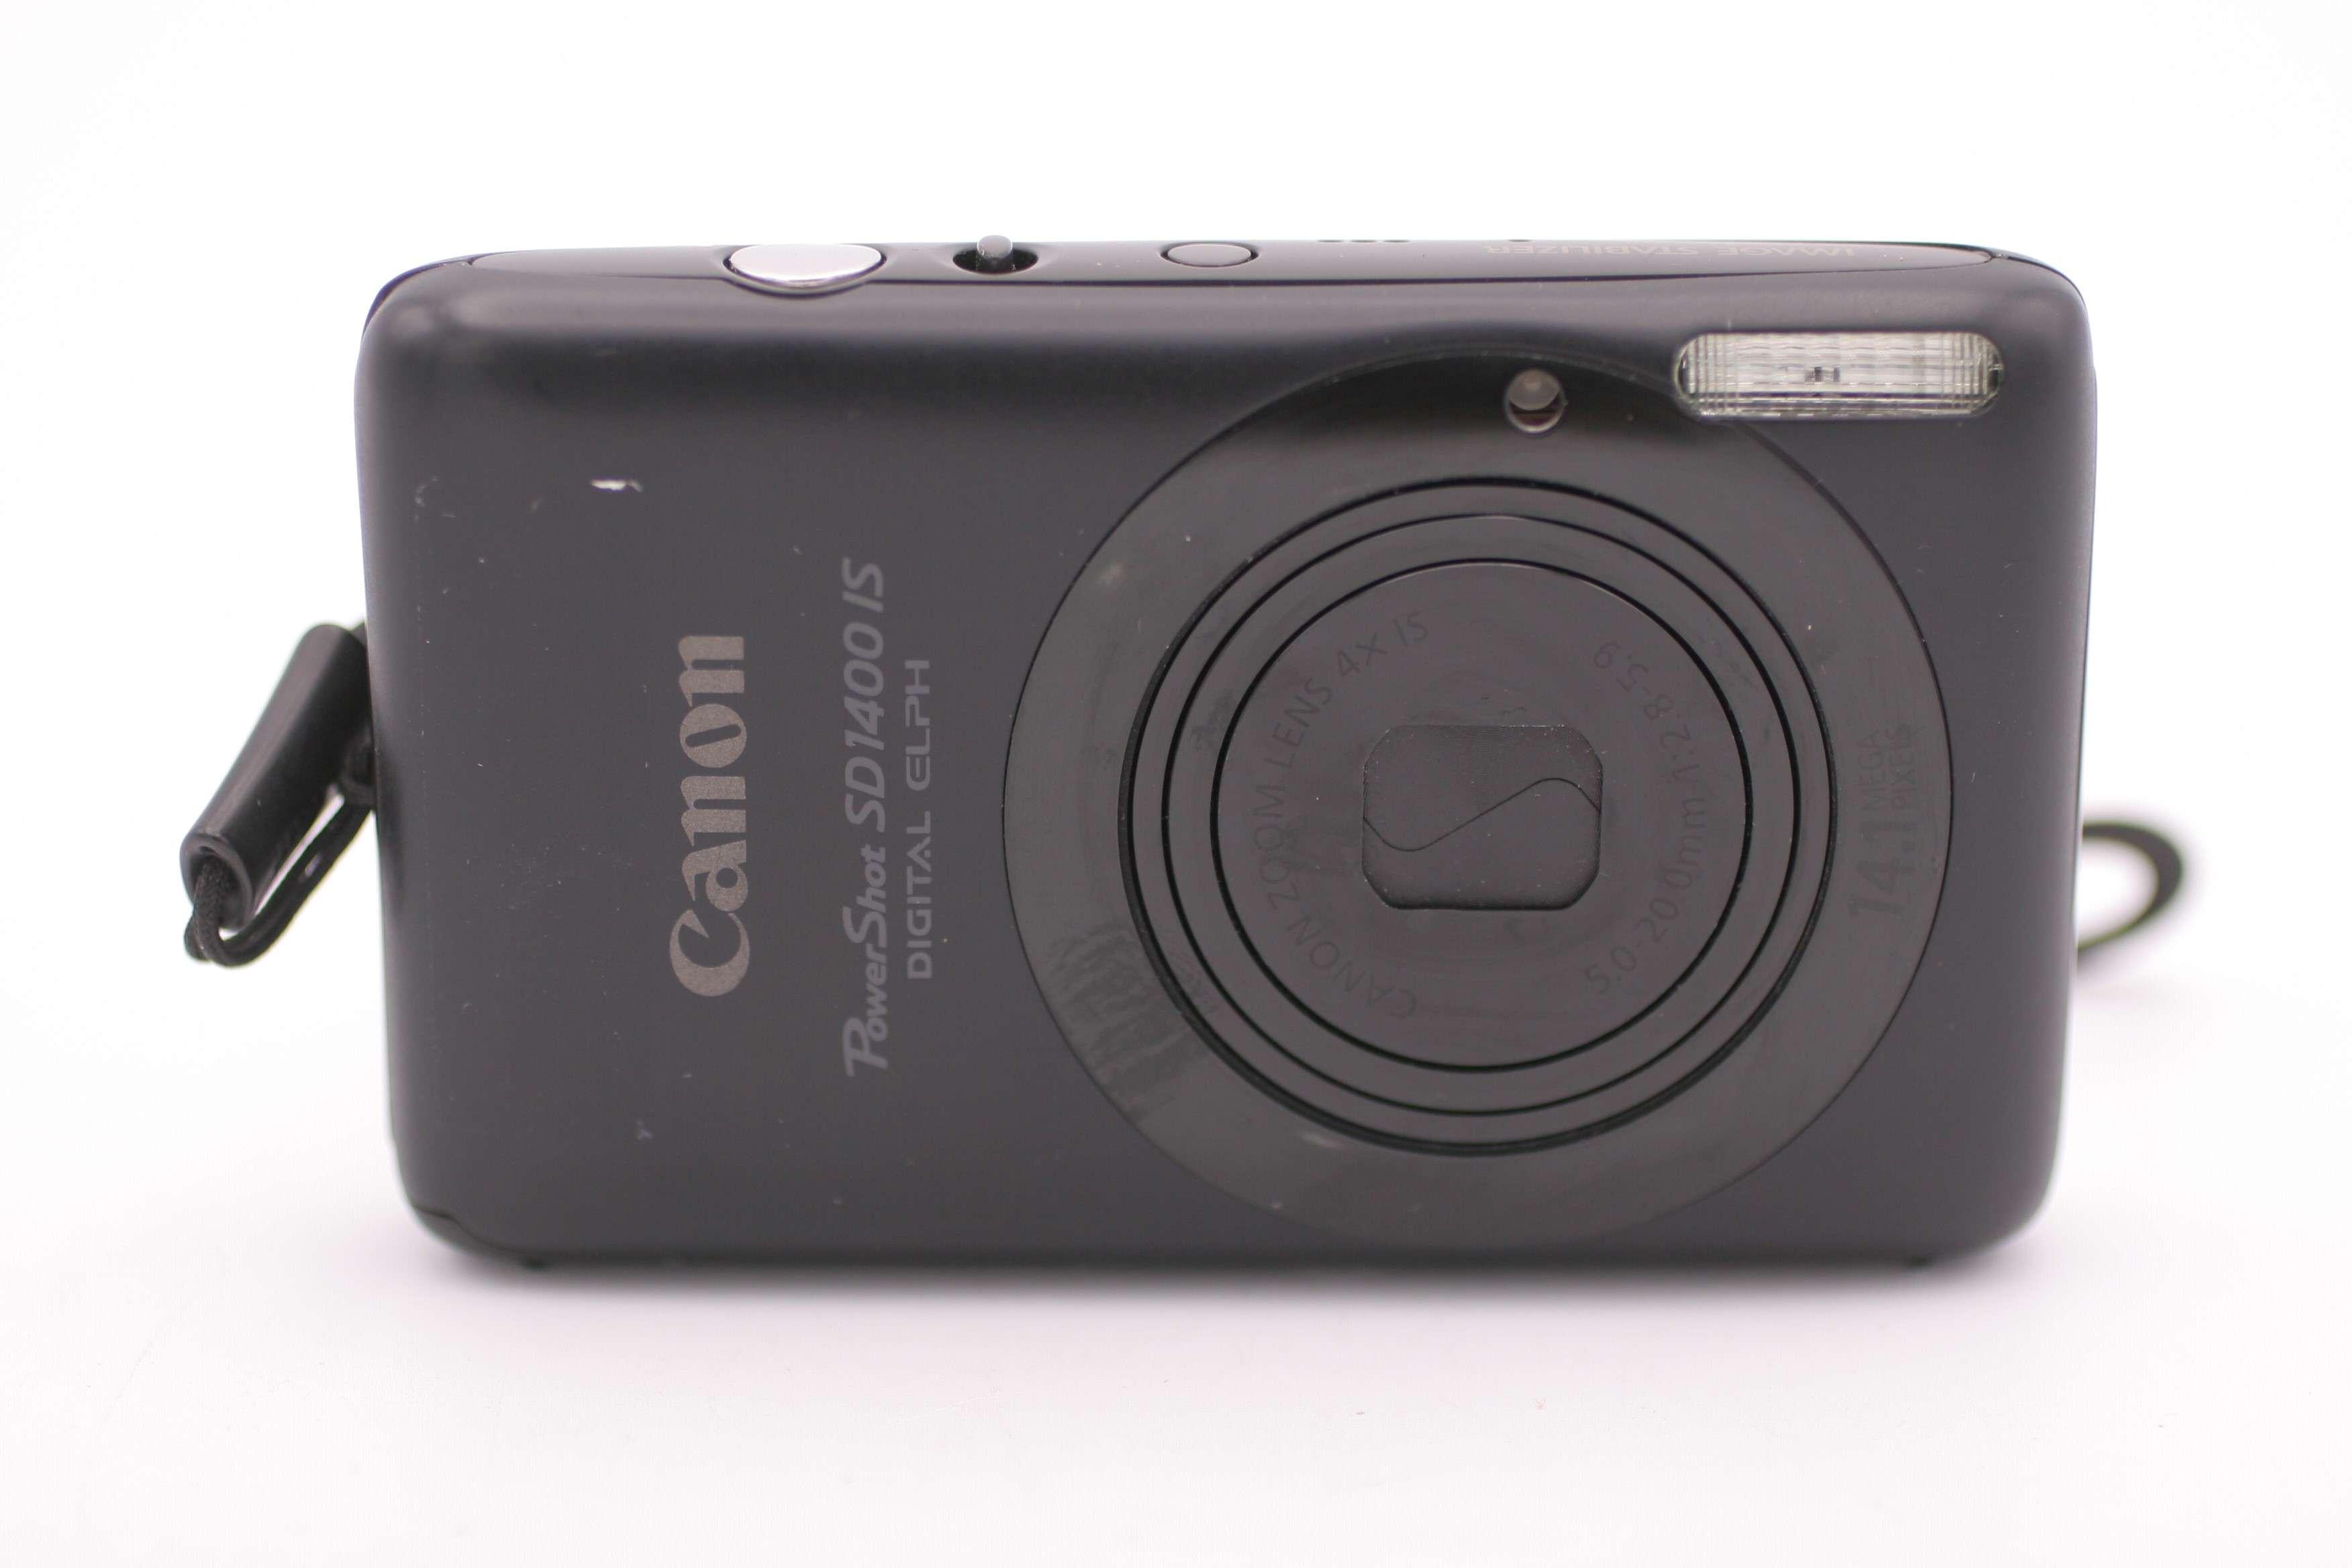 Details about Canon PowerShot Digital ELPH SD1400 IS / IXUS 130 14 1MP  digital Camera - Black